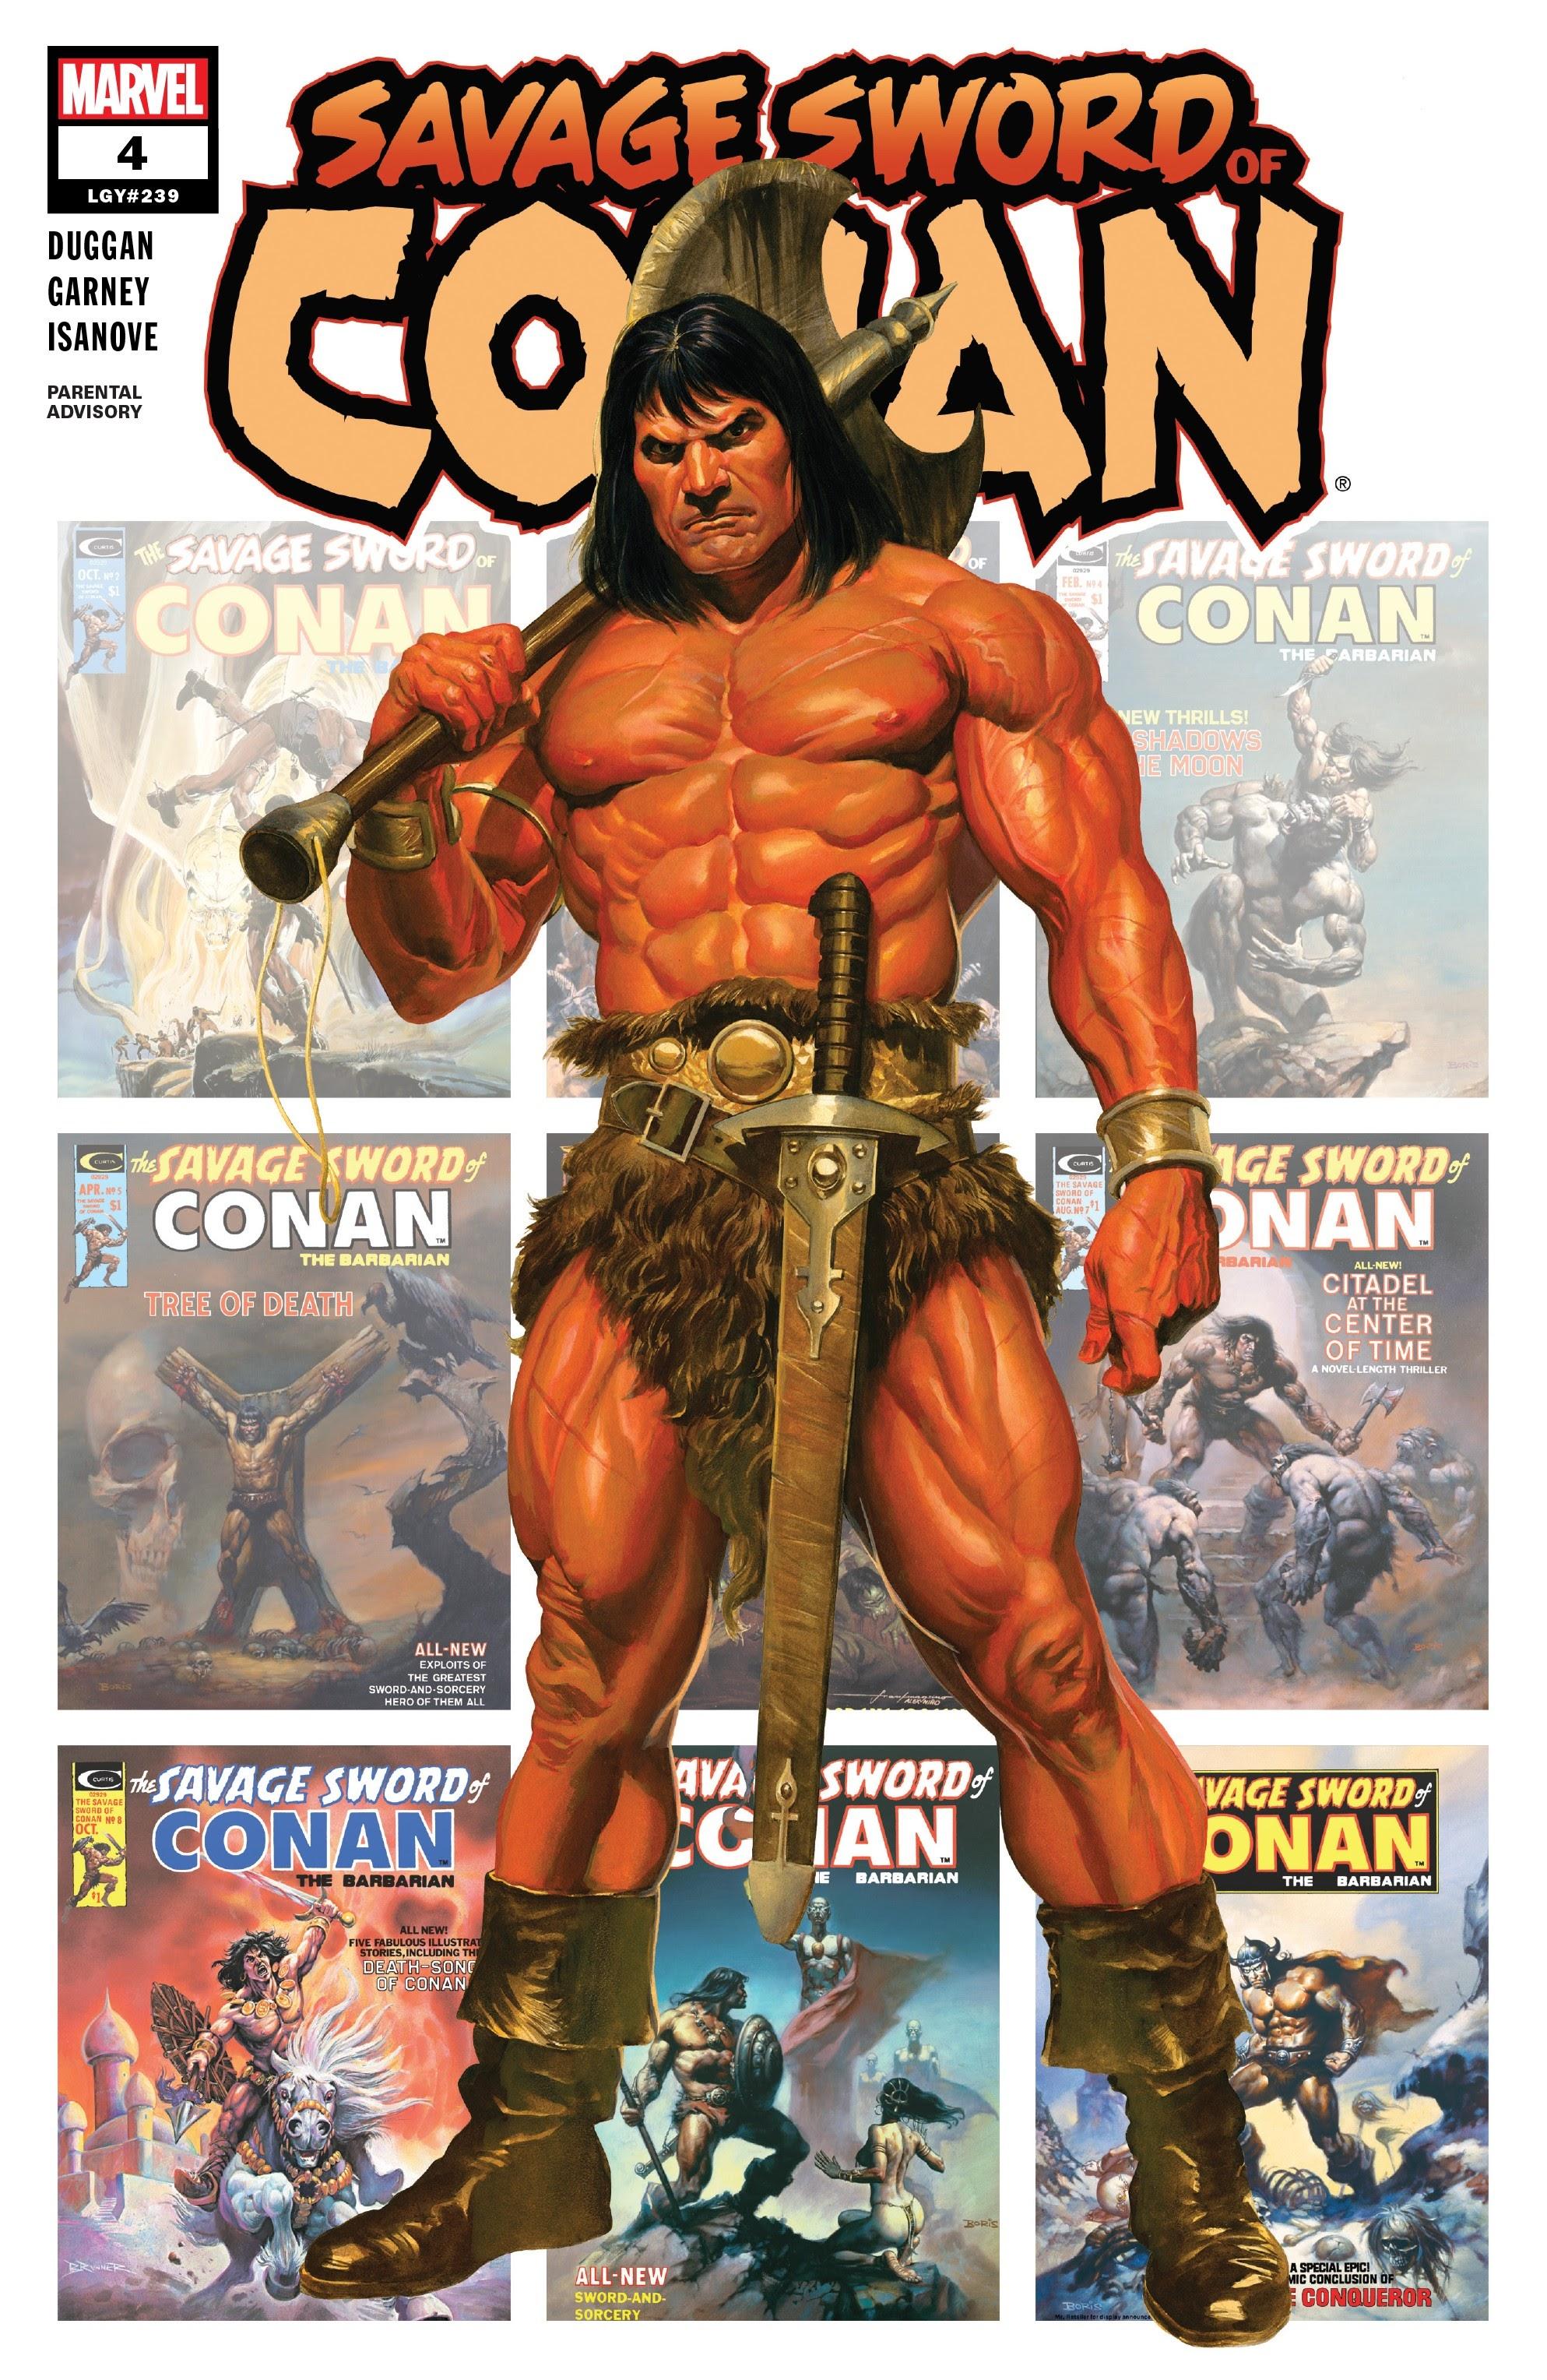 Savage Sword of Conan 4 Page 1